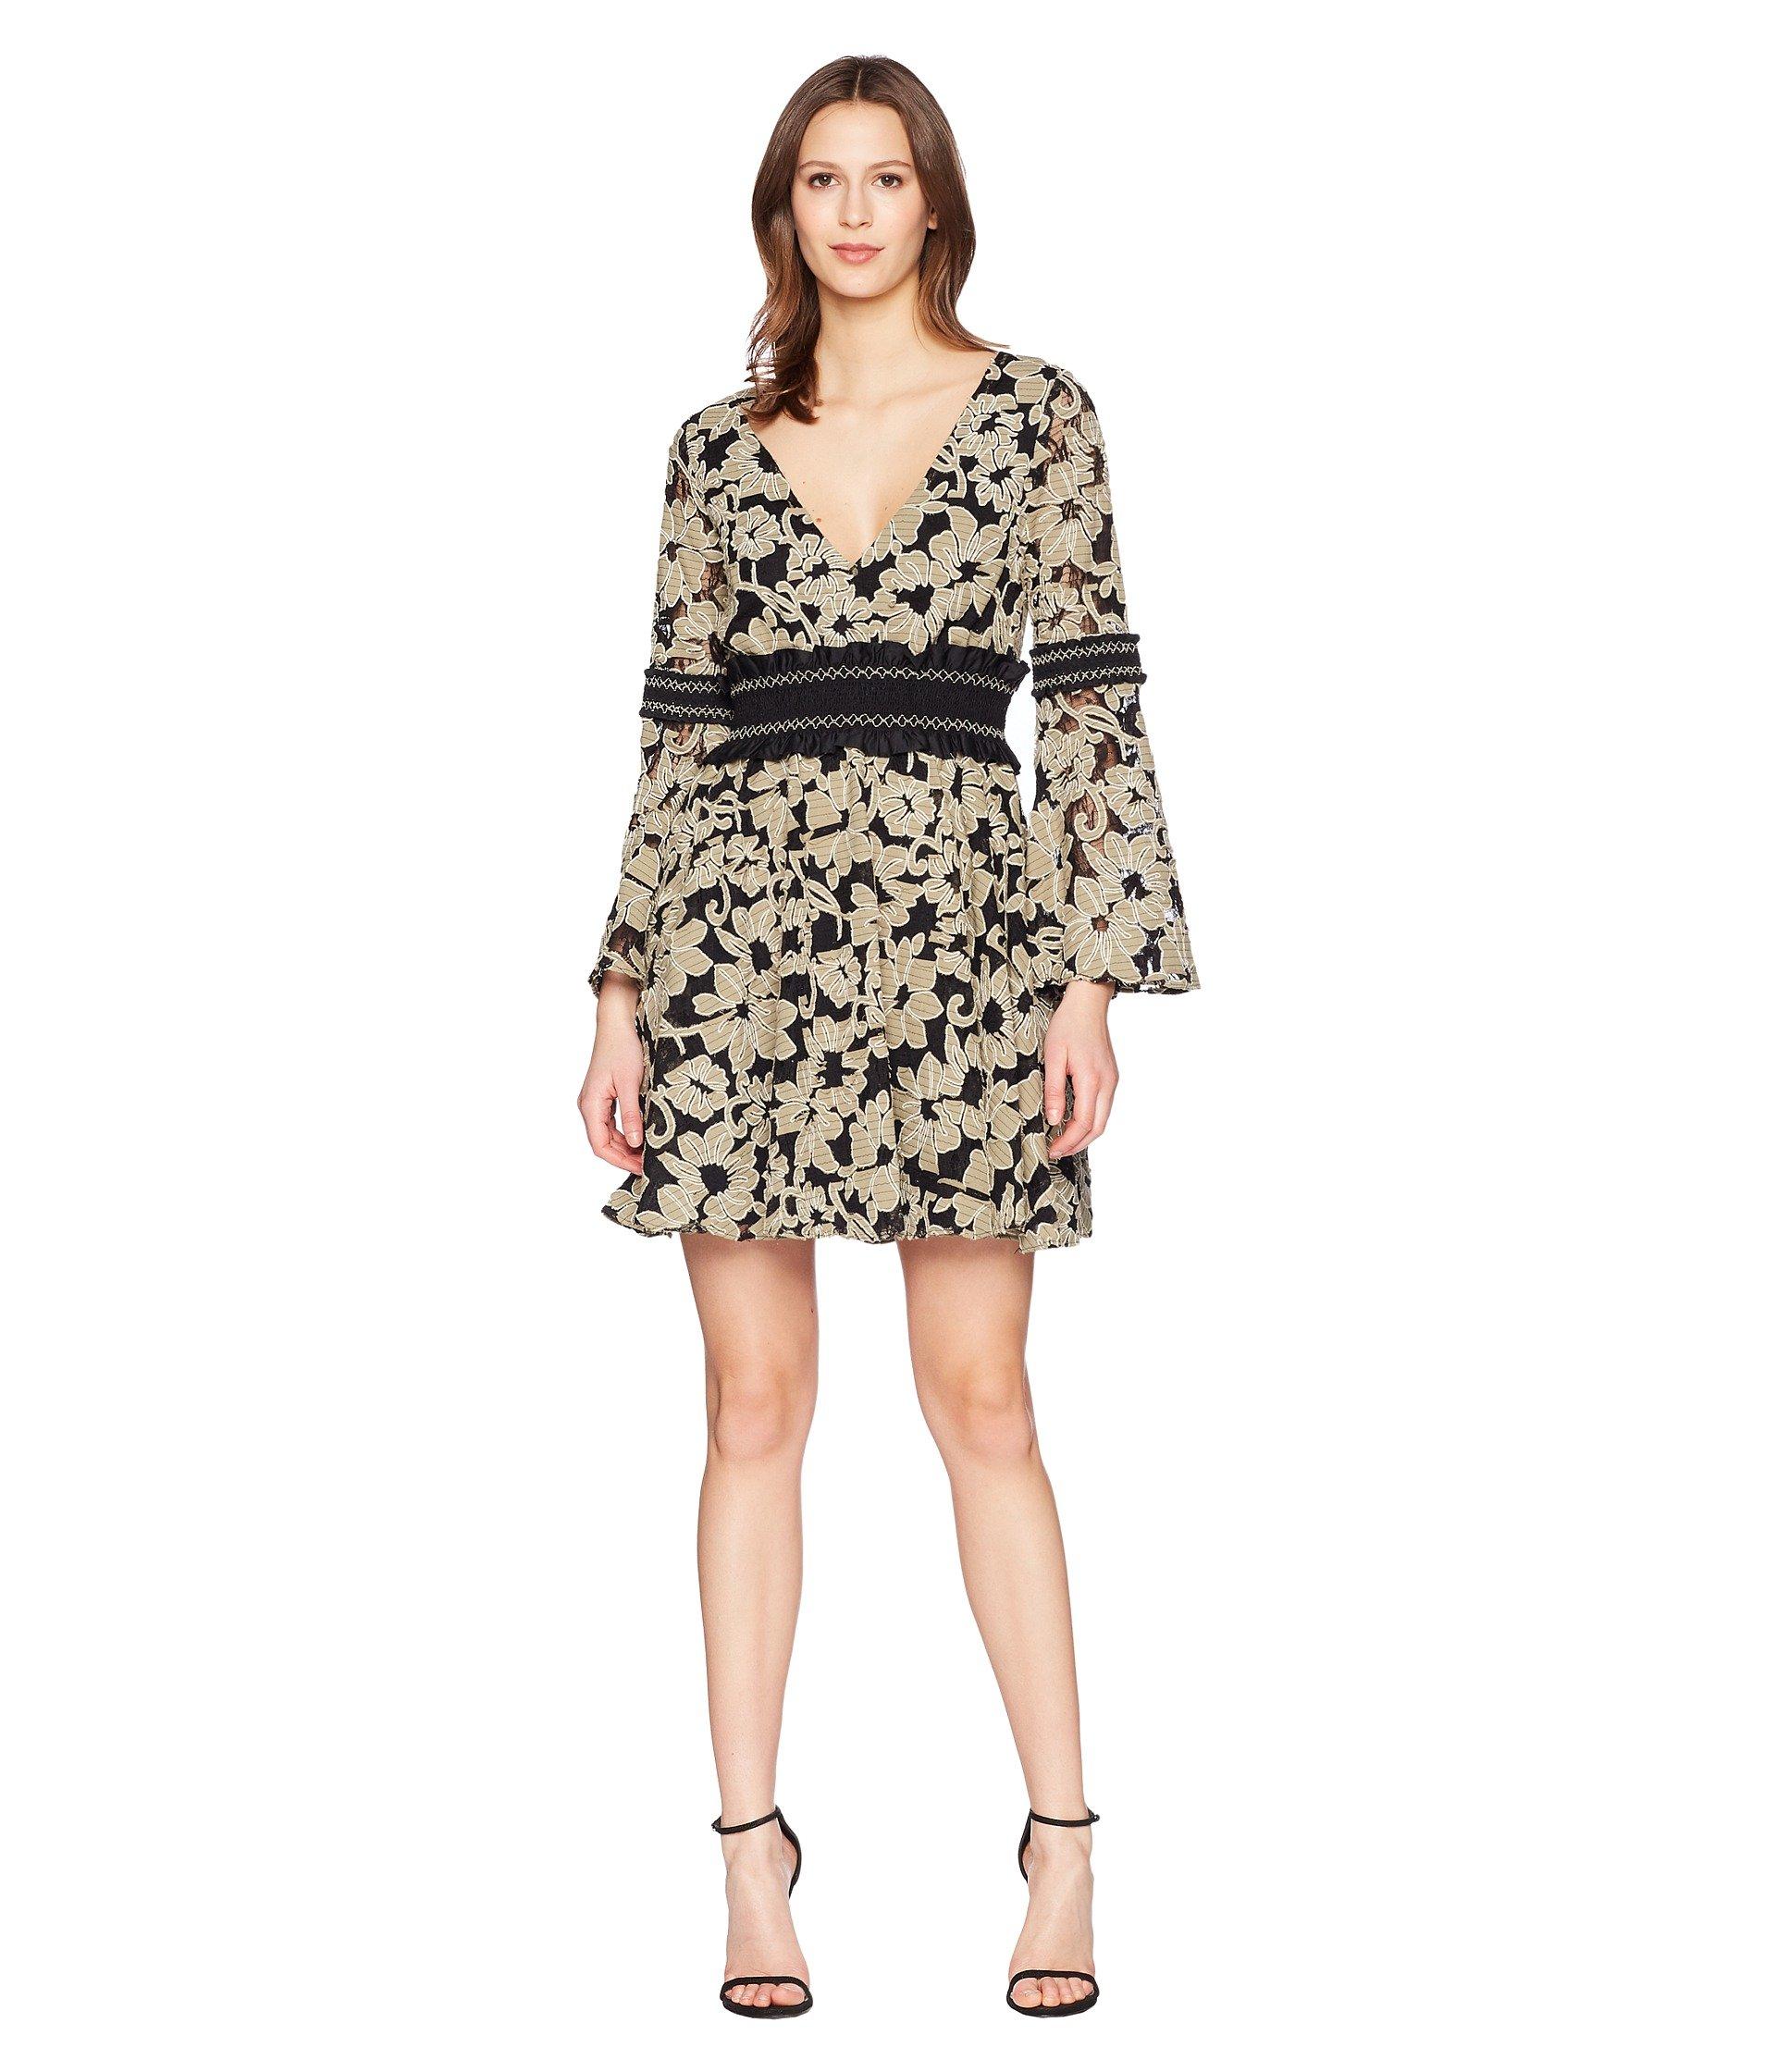 Vestido para Mujer ZAC Zac Posen Mika Dress  + ZAC Zac Posen en VeoyCompro.net